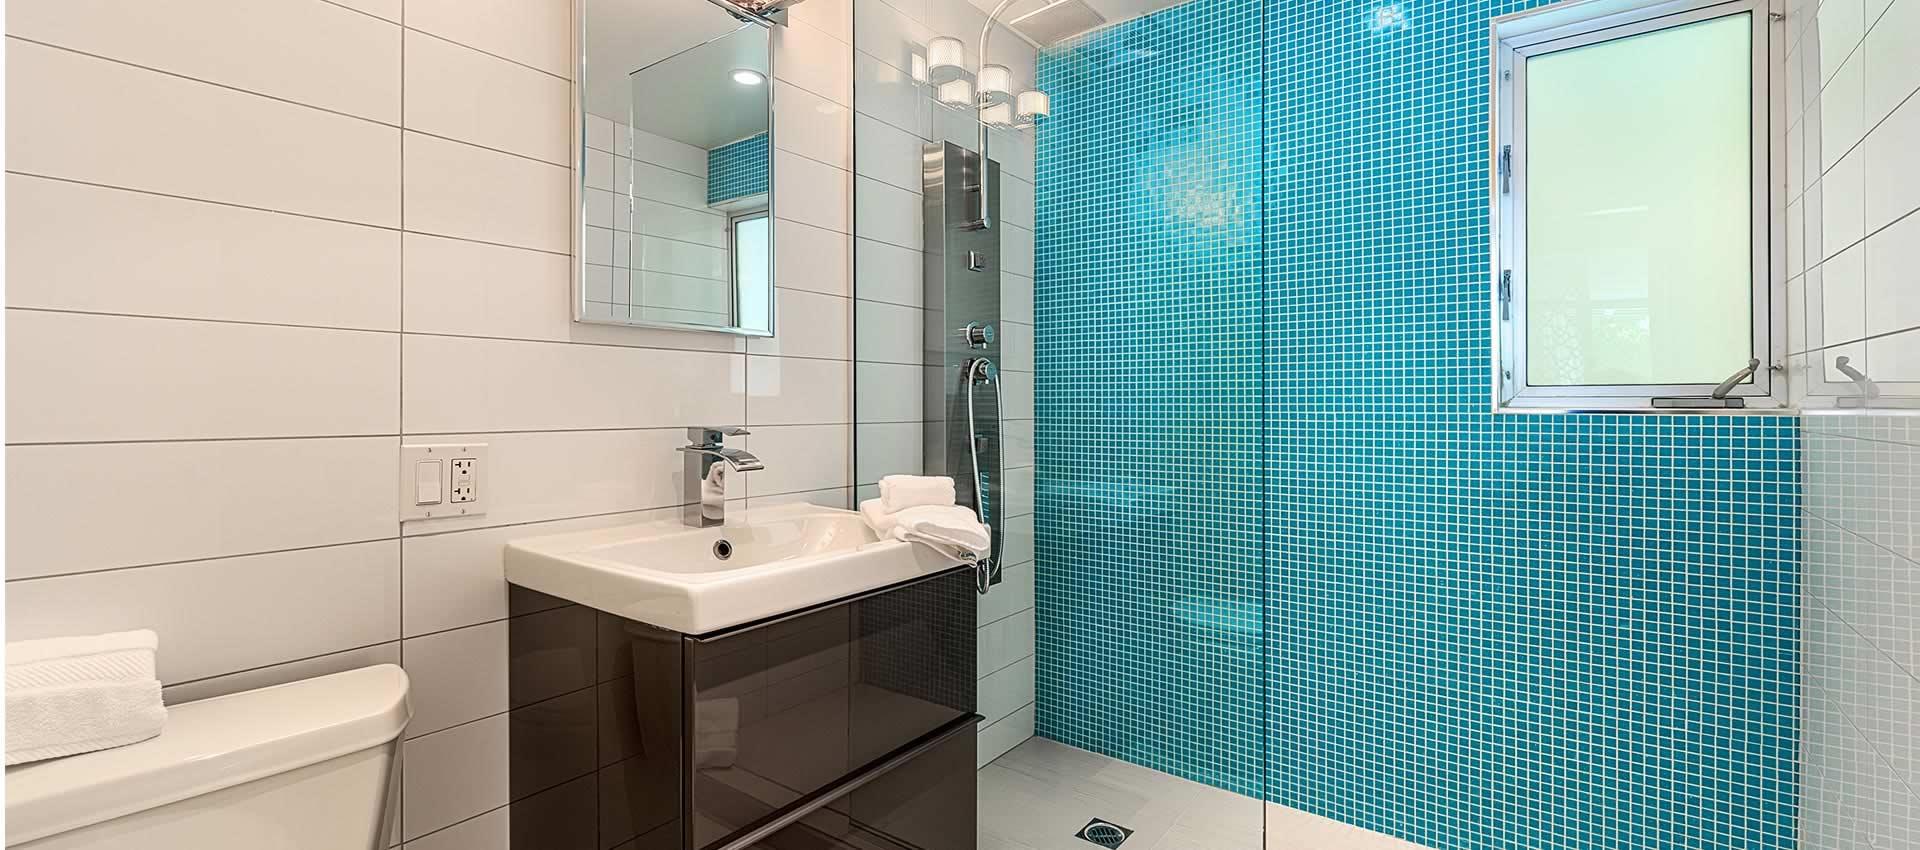 twist-hotel-studio-bath